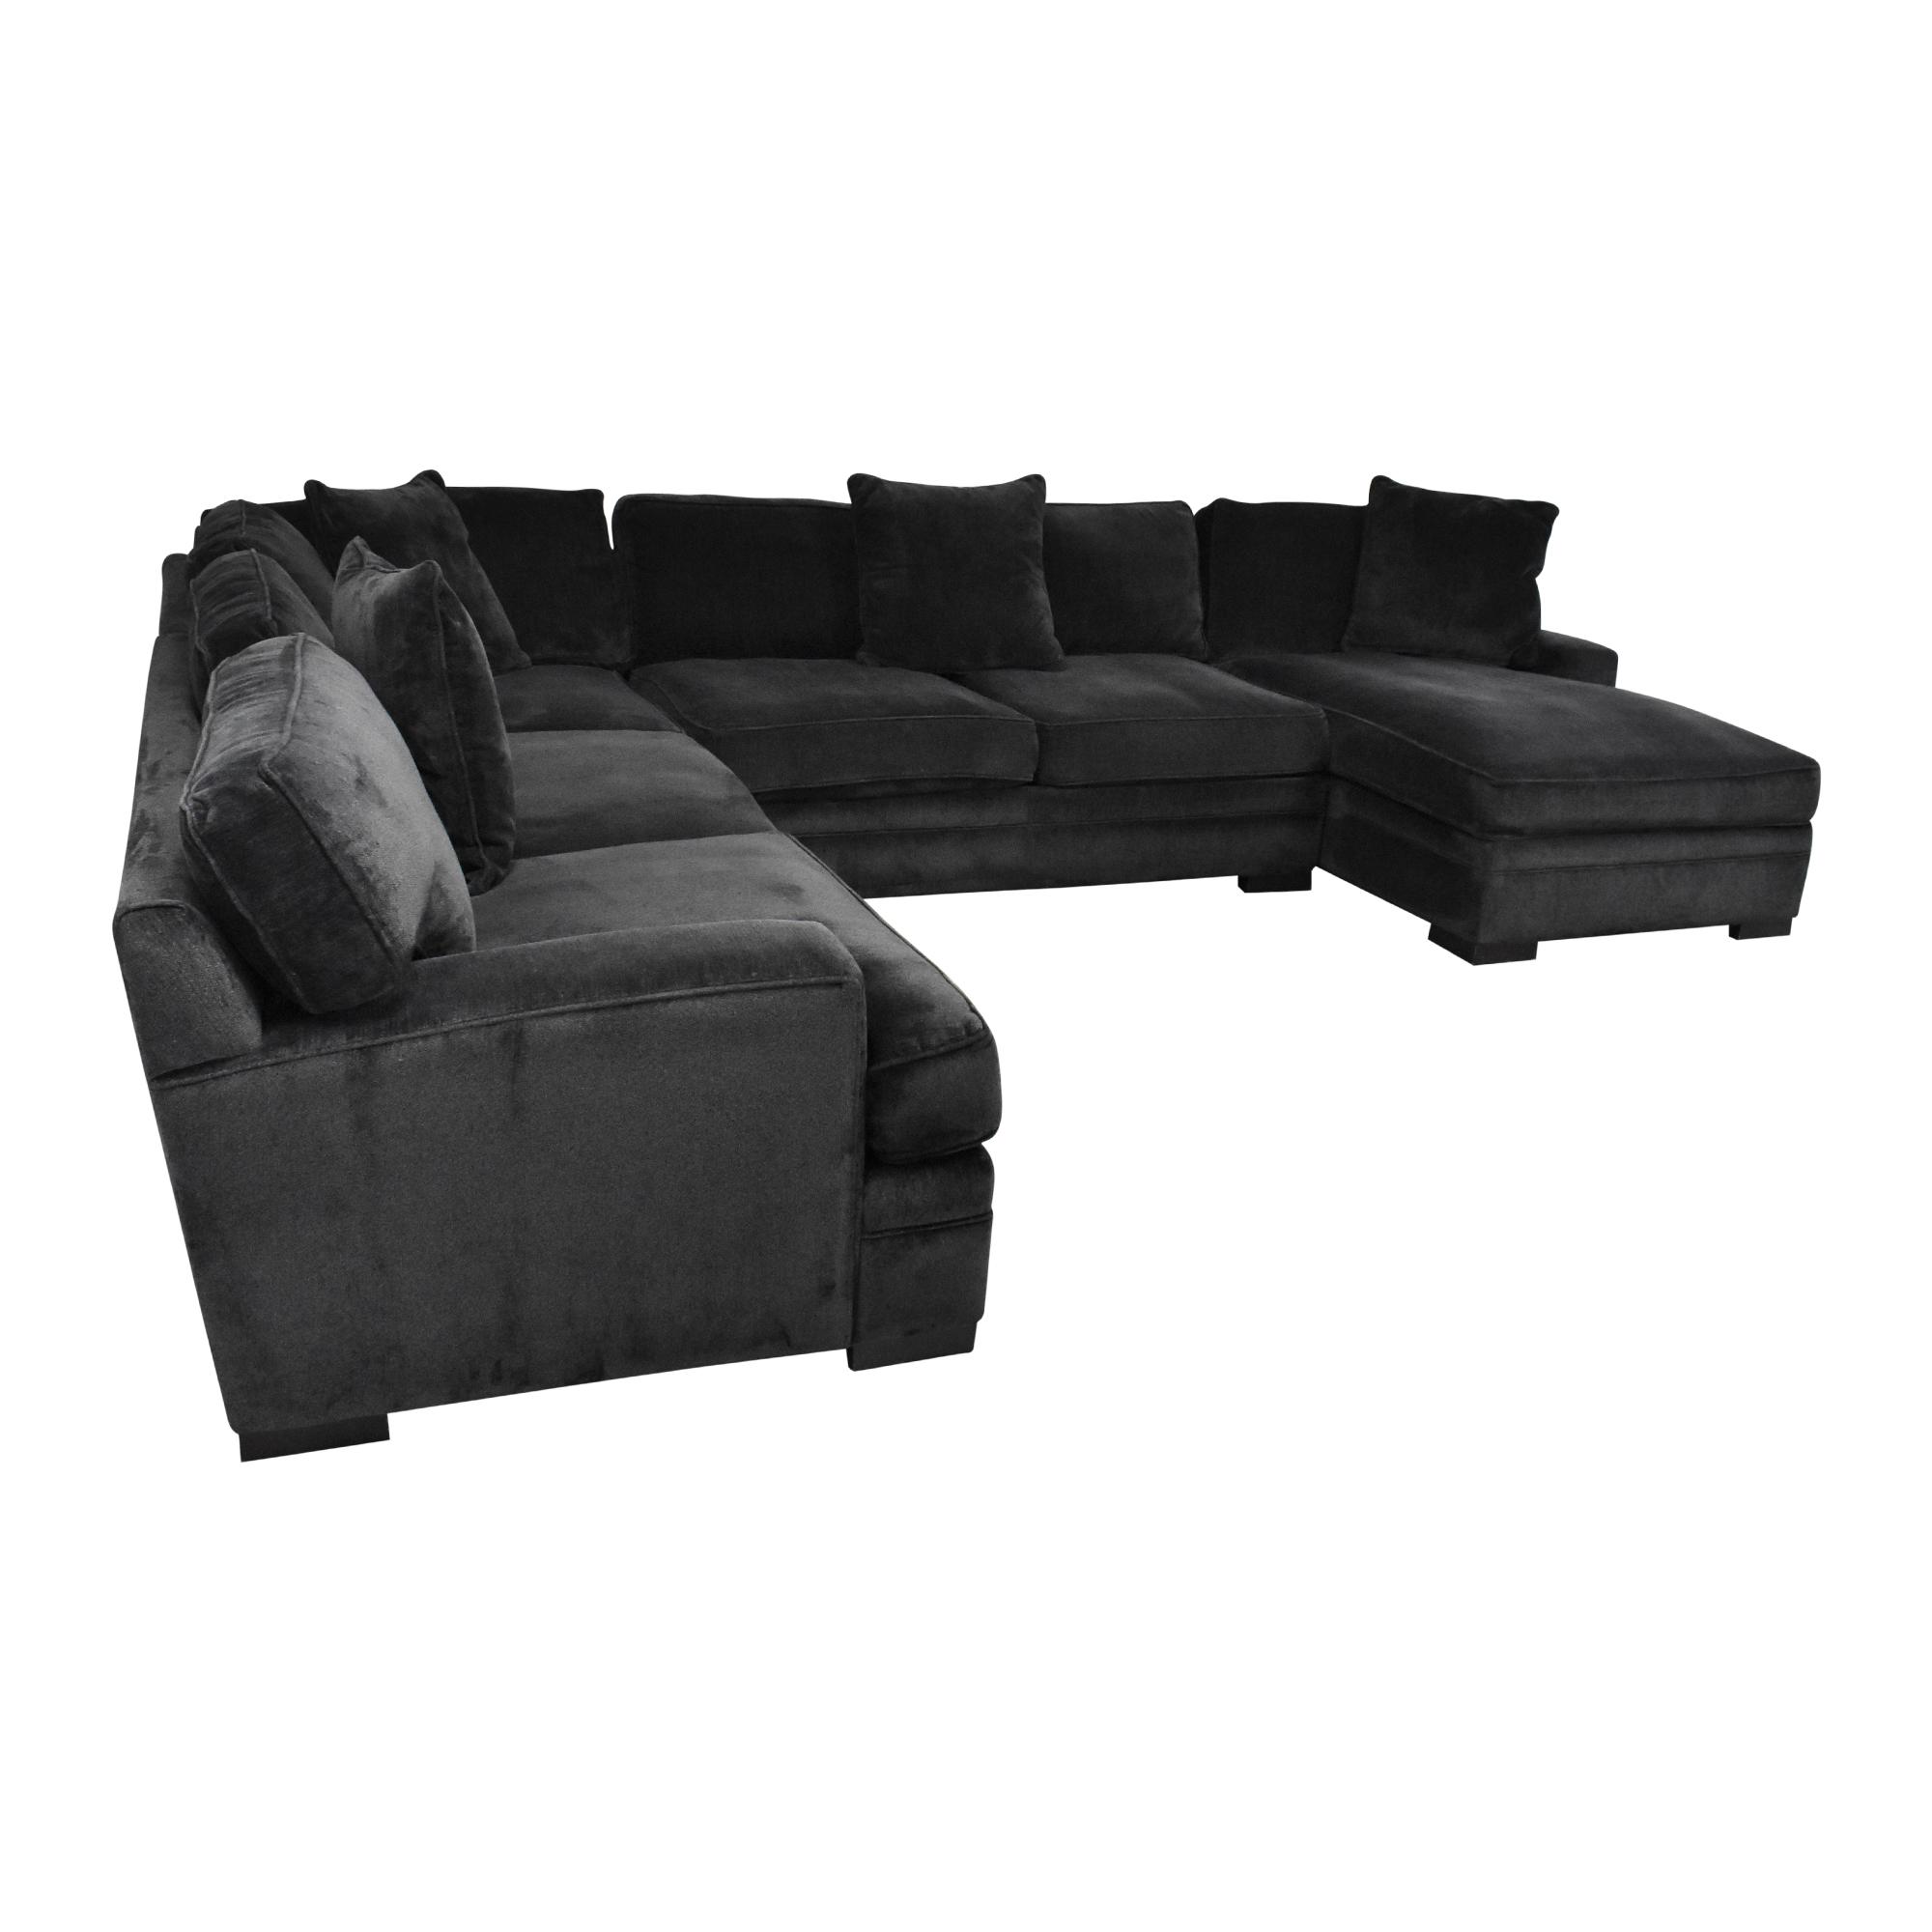 Macy's Macy's Teddy Four Piece Chaise Sectional Sofa for sale